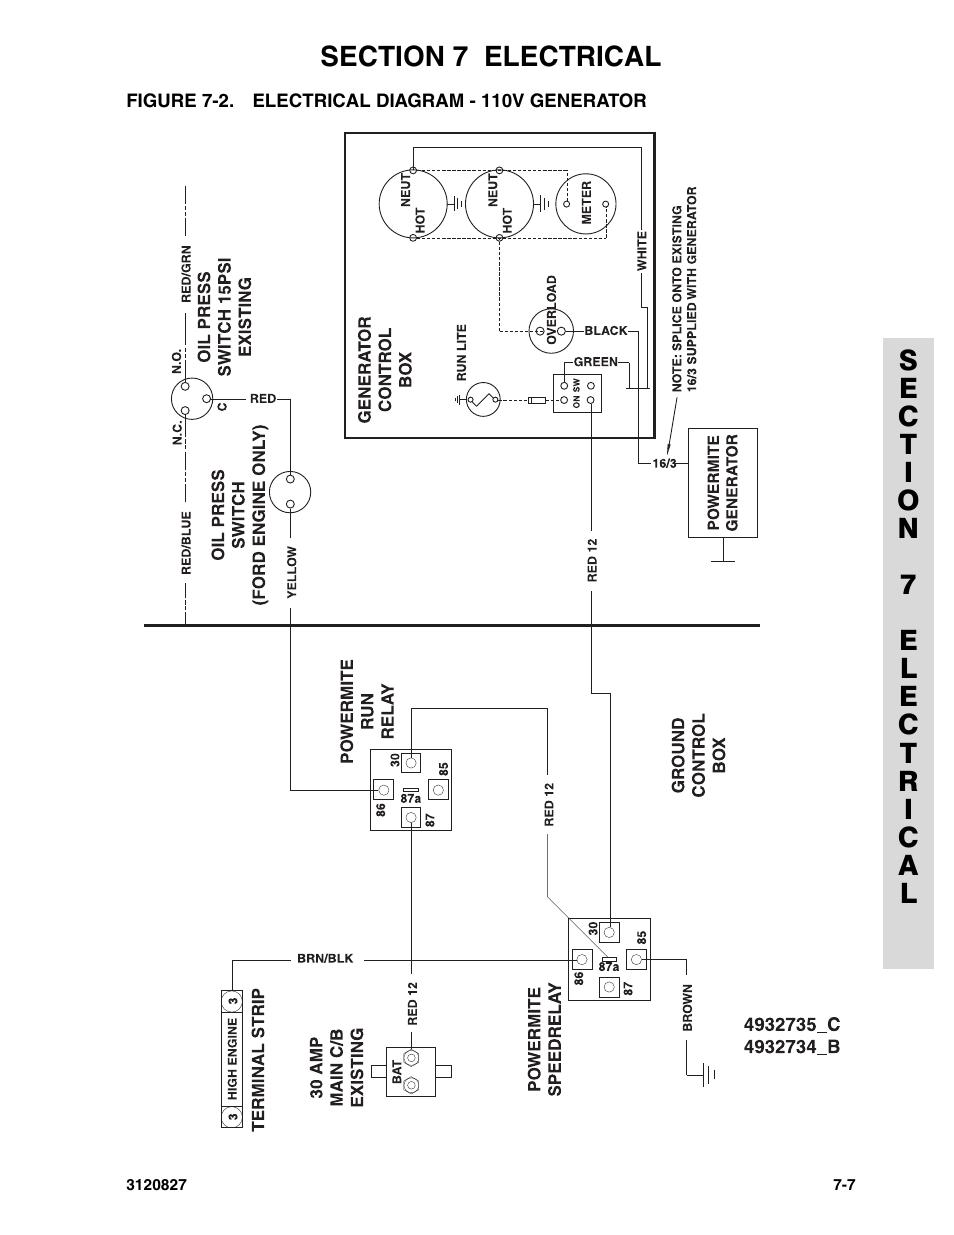 [DIAGRAM_5LK]  5915 Jlg Battery Wiring Diagram | Best Wiring Library | Wiring Library | Jlg N40e Wiring Diagram |  | Wiring Library